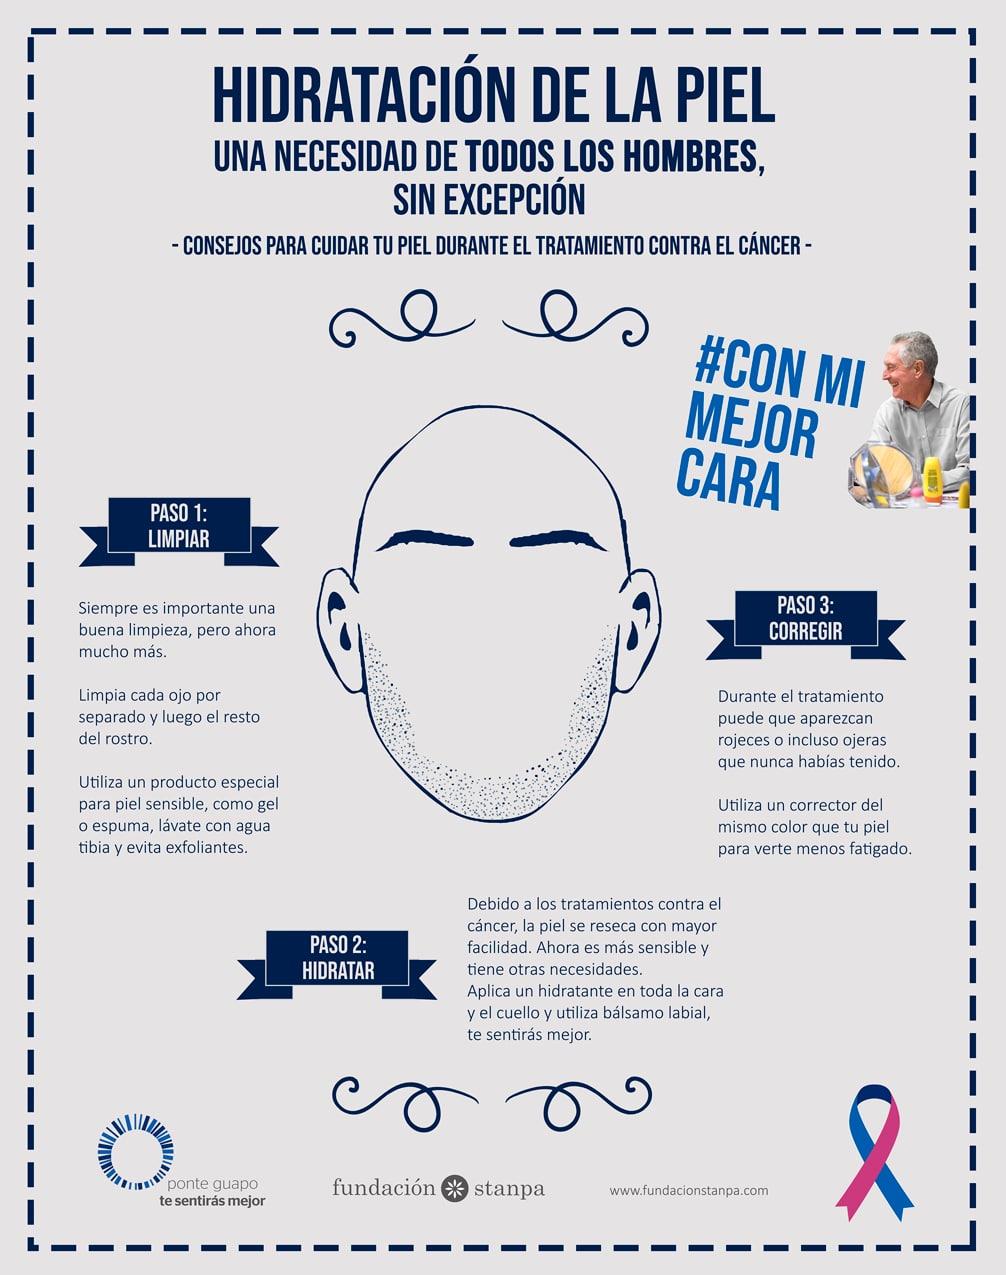 Skin Hydration Stanpa Spanish Cosmetics Toiletry And Perfumery Association